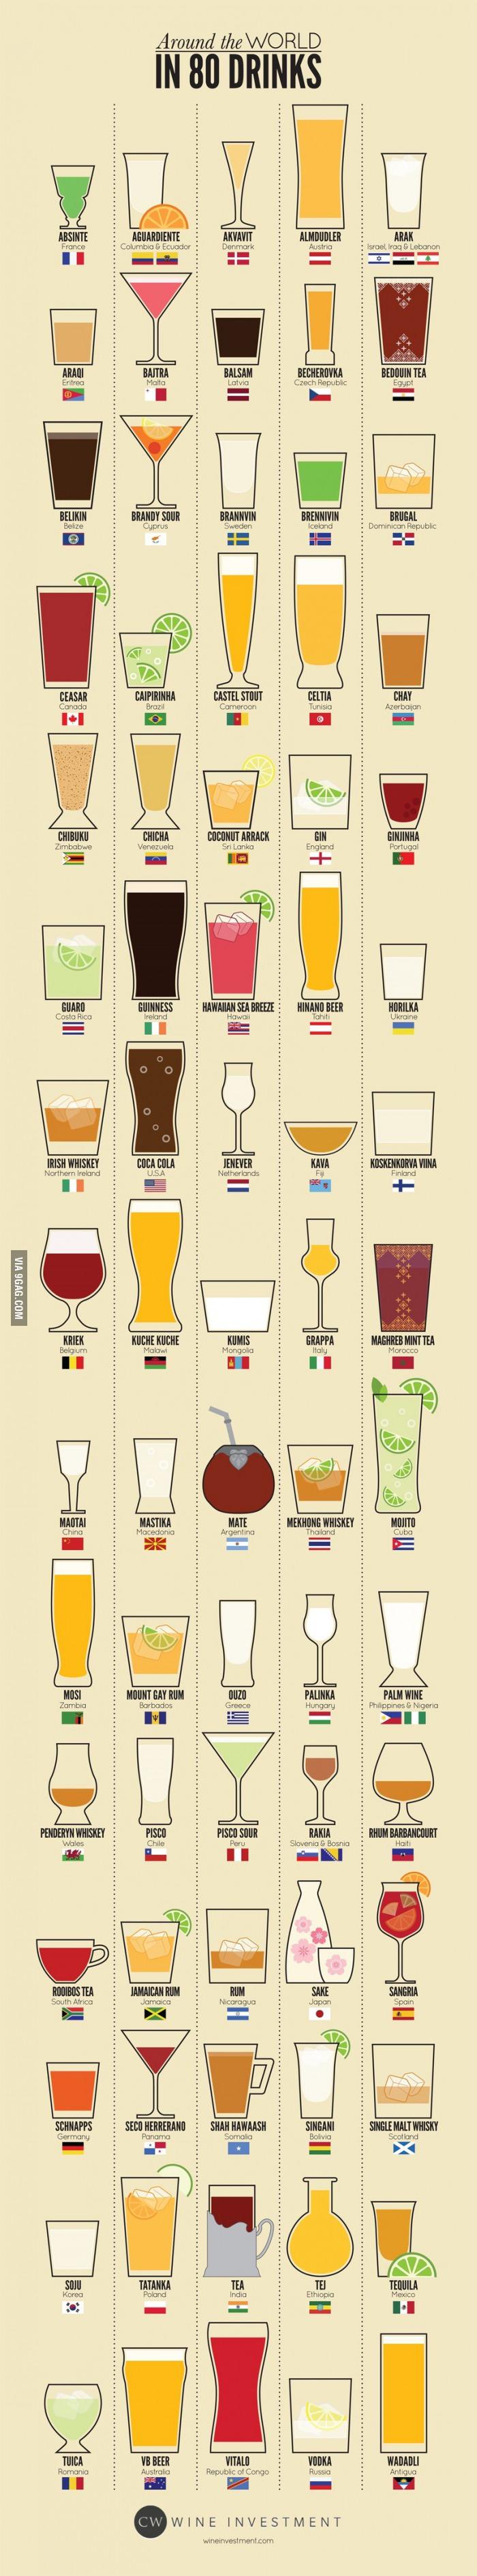 alcool-monde